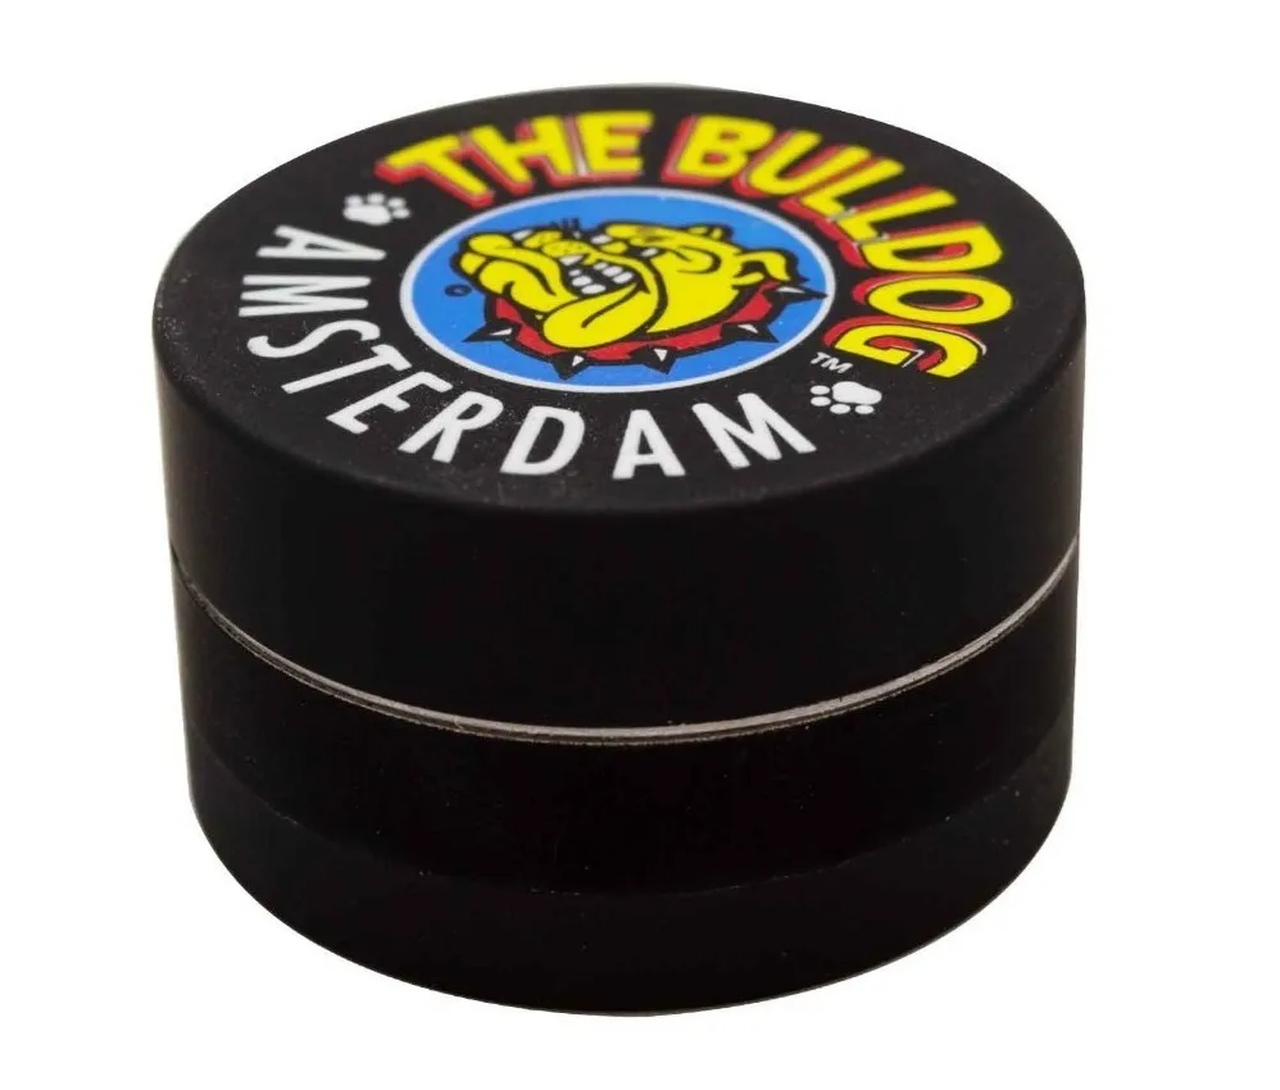 Dichavador The Bulldog 3 Partes Original METAL PRETO